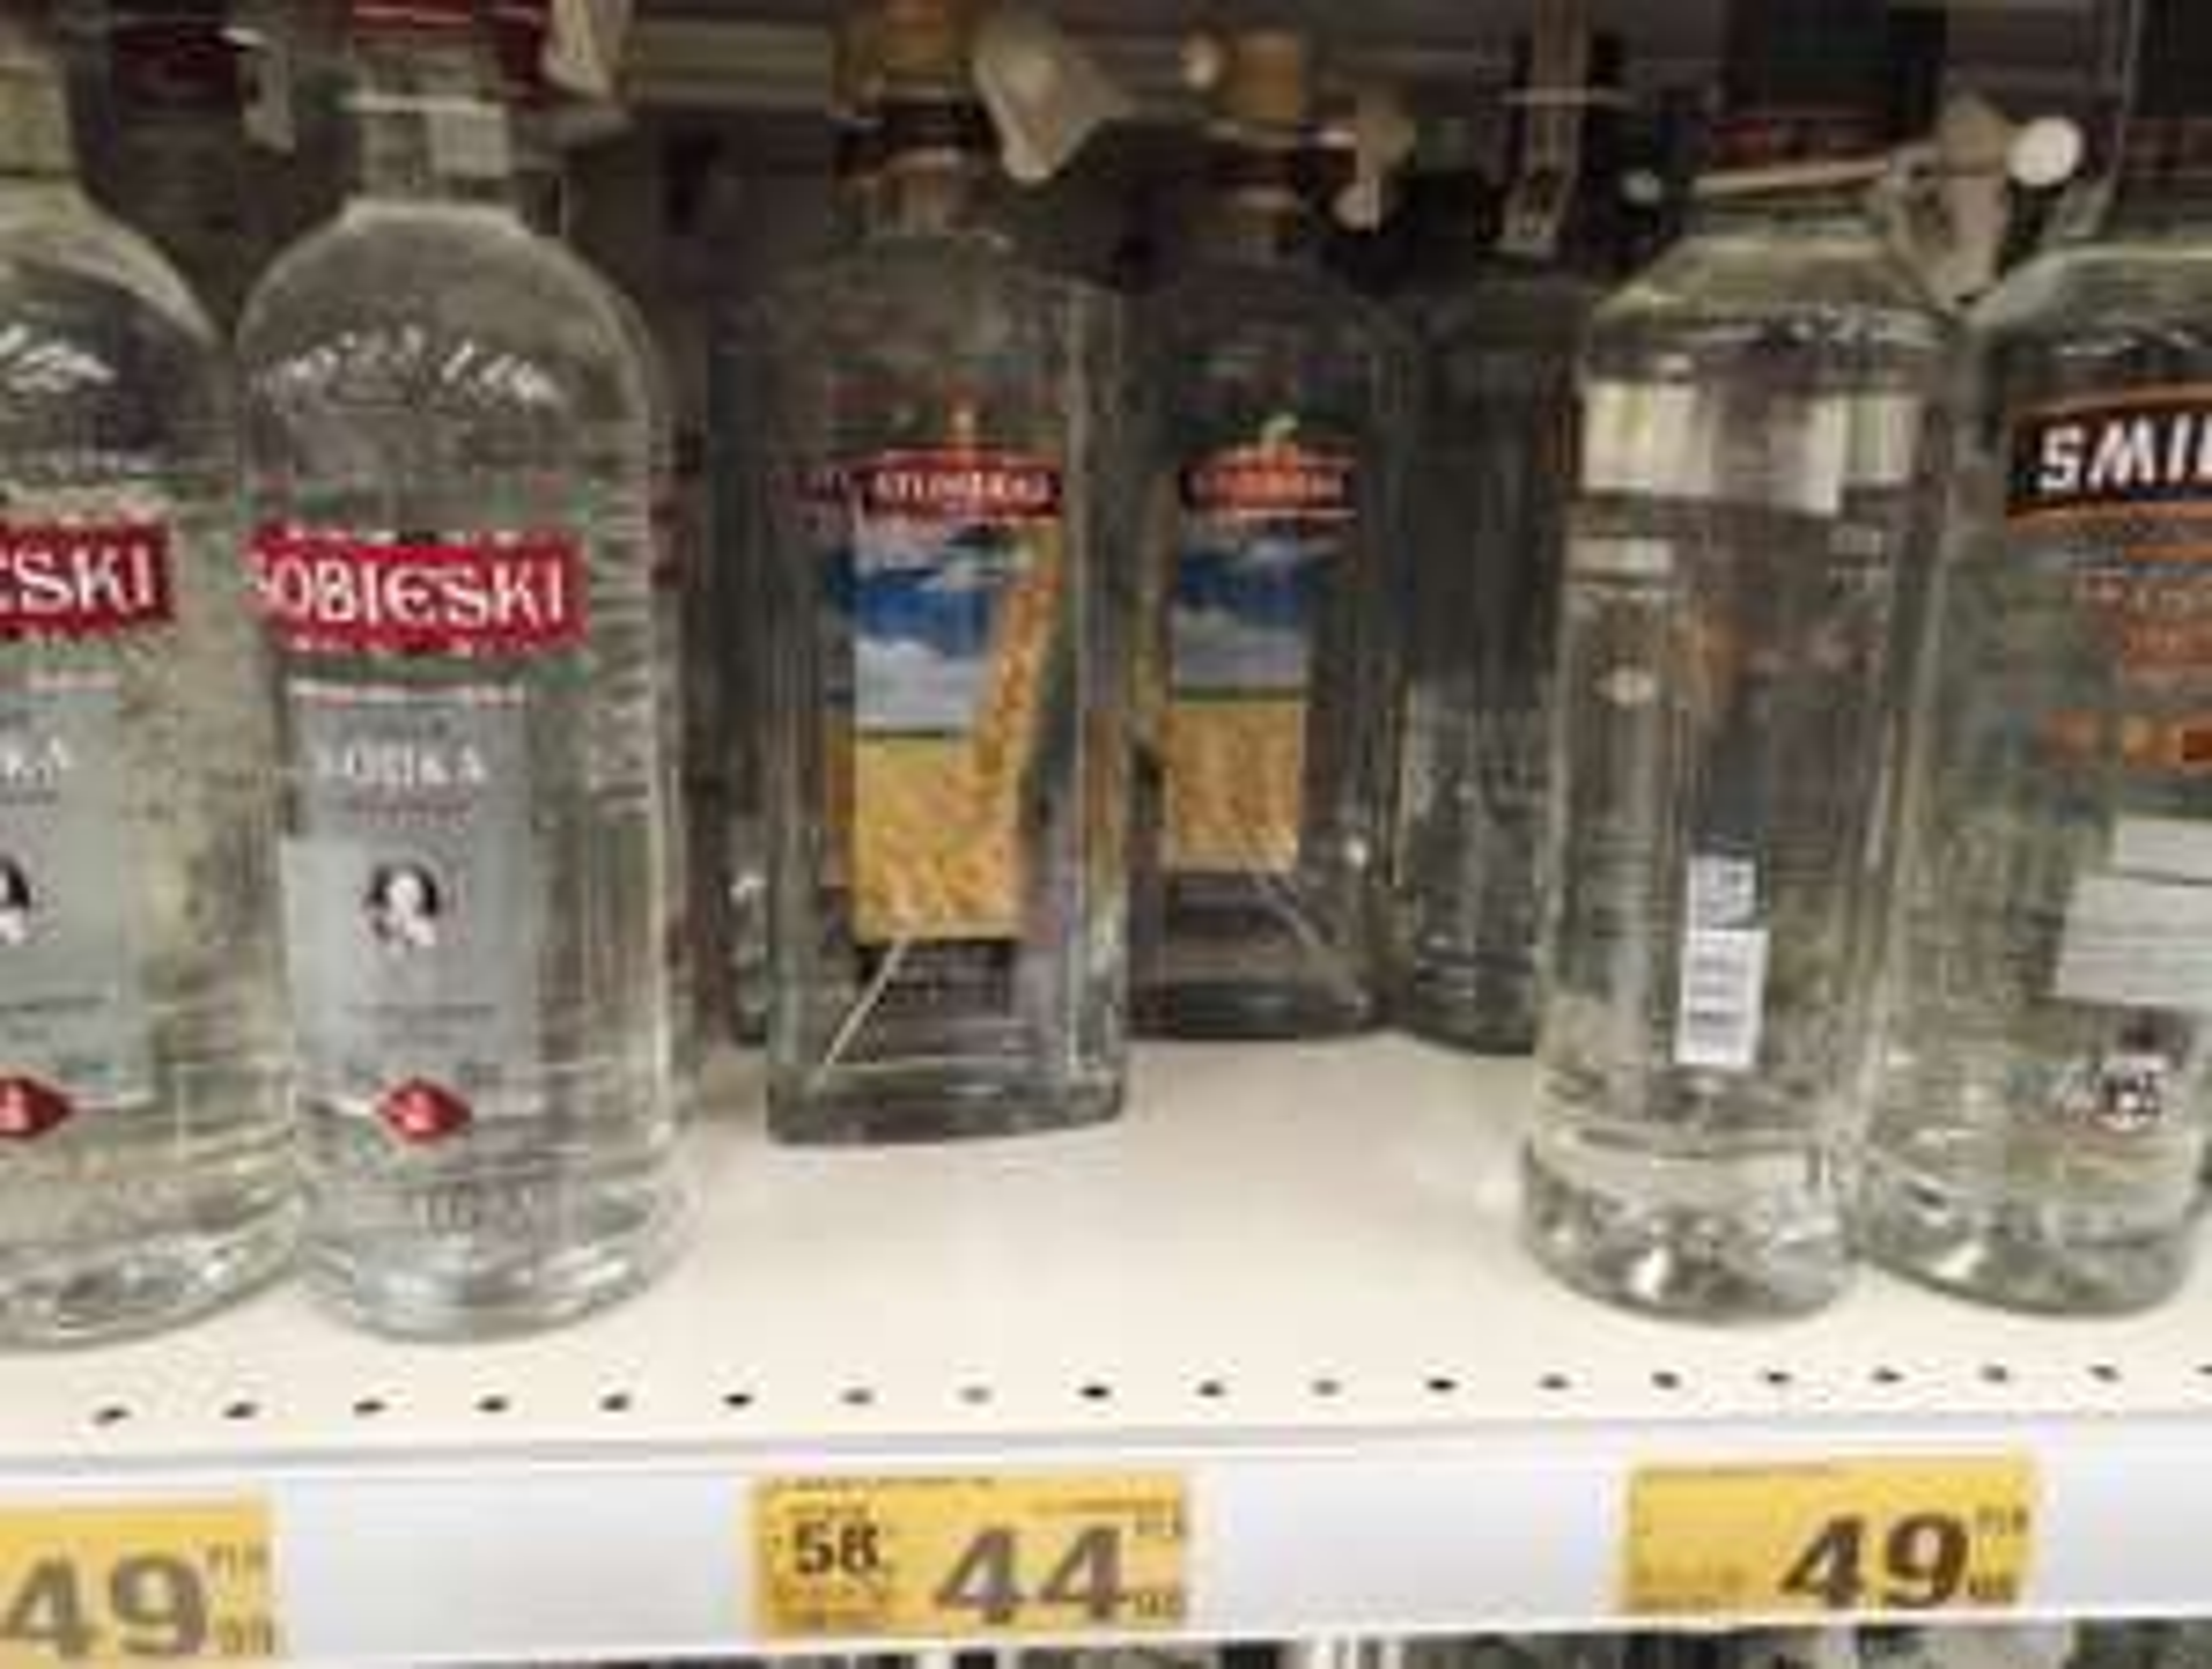 STUMBRAS wódka z kłosem 40% 1l - Auchan Radom